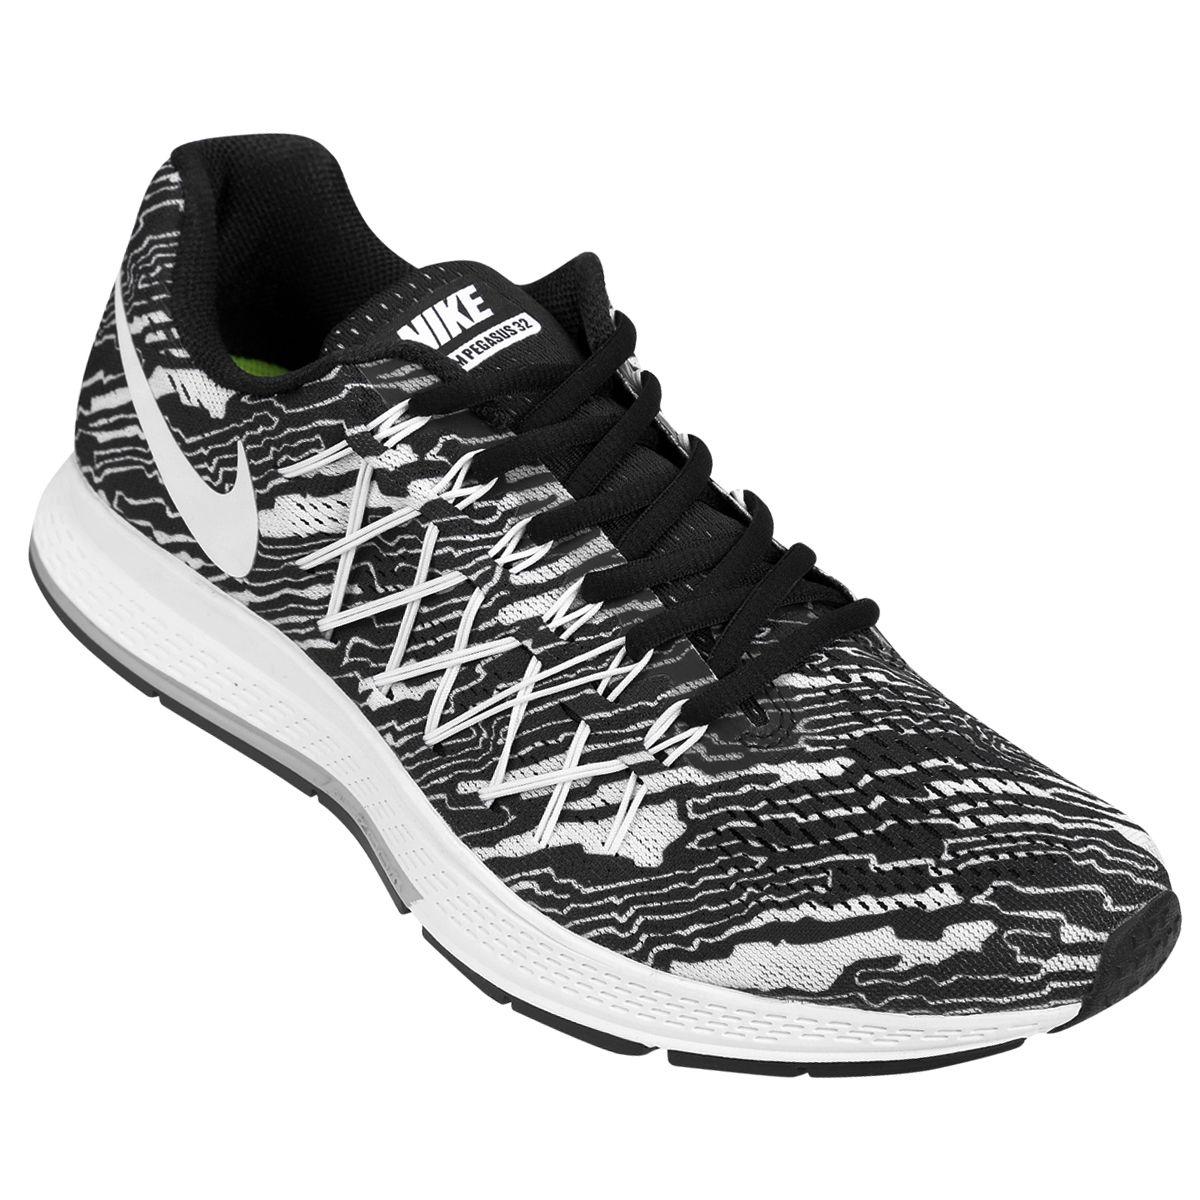 Nike Roshe Run Todos aman